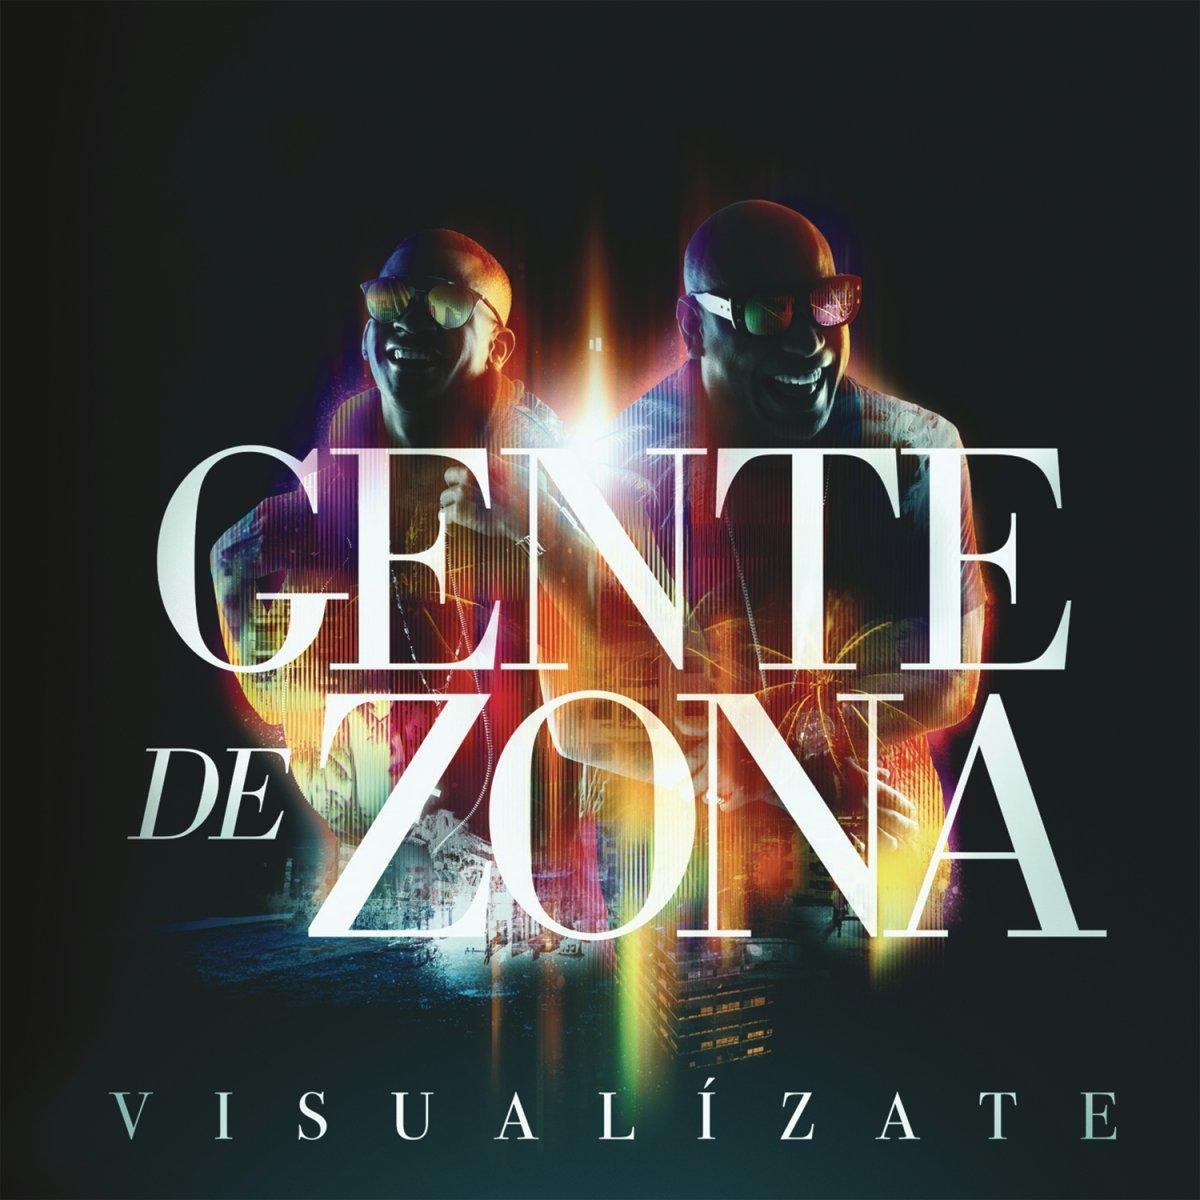 GENTE DE ZONA - VISUALIZATE (CD)